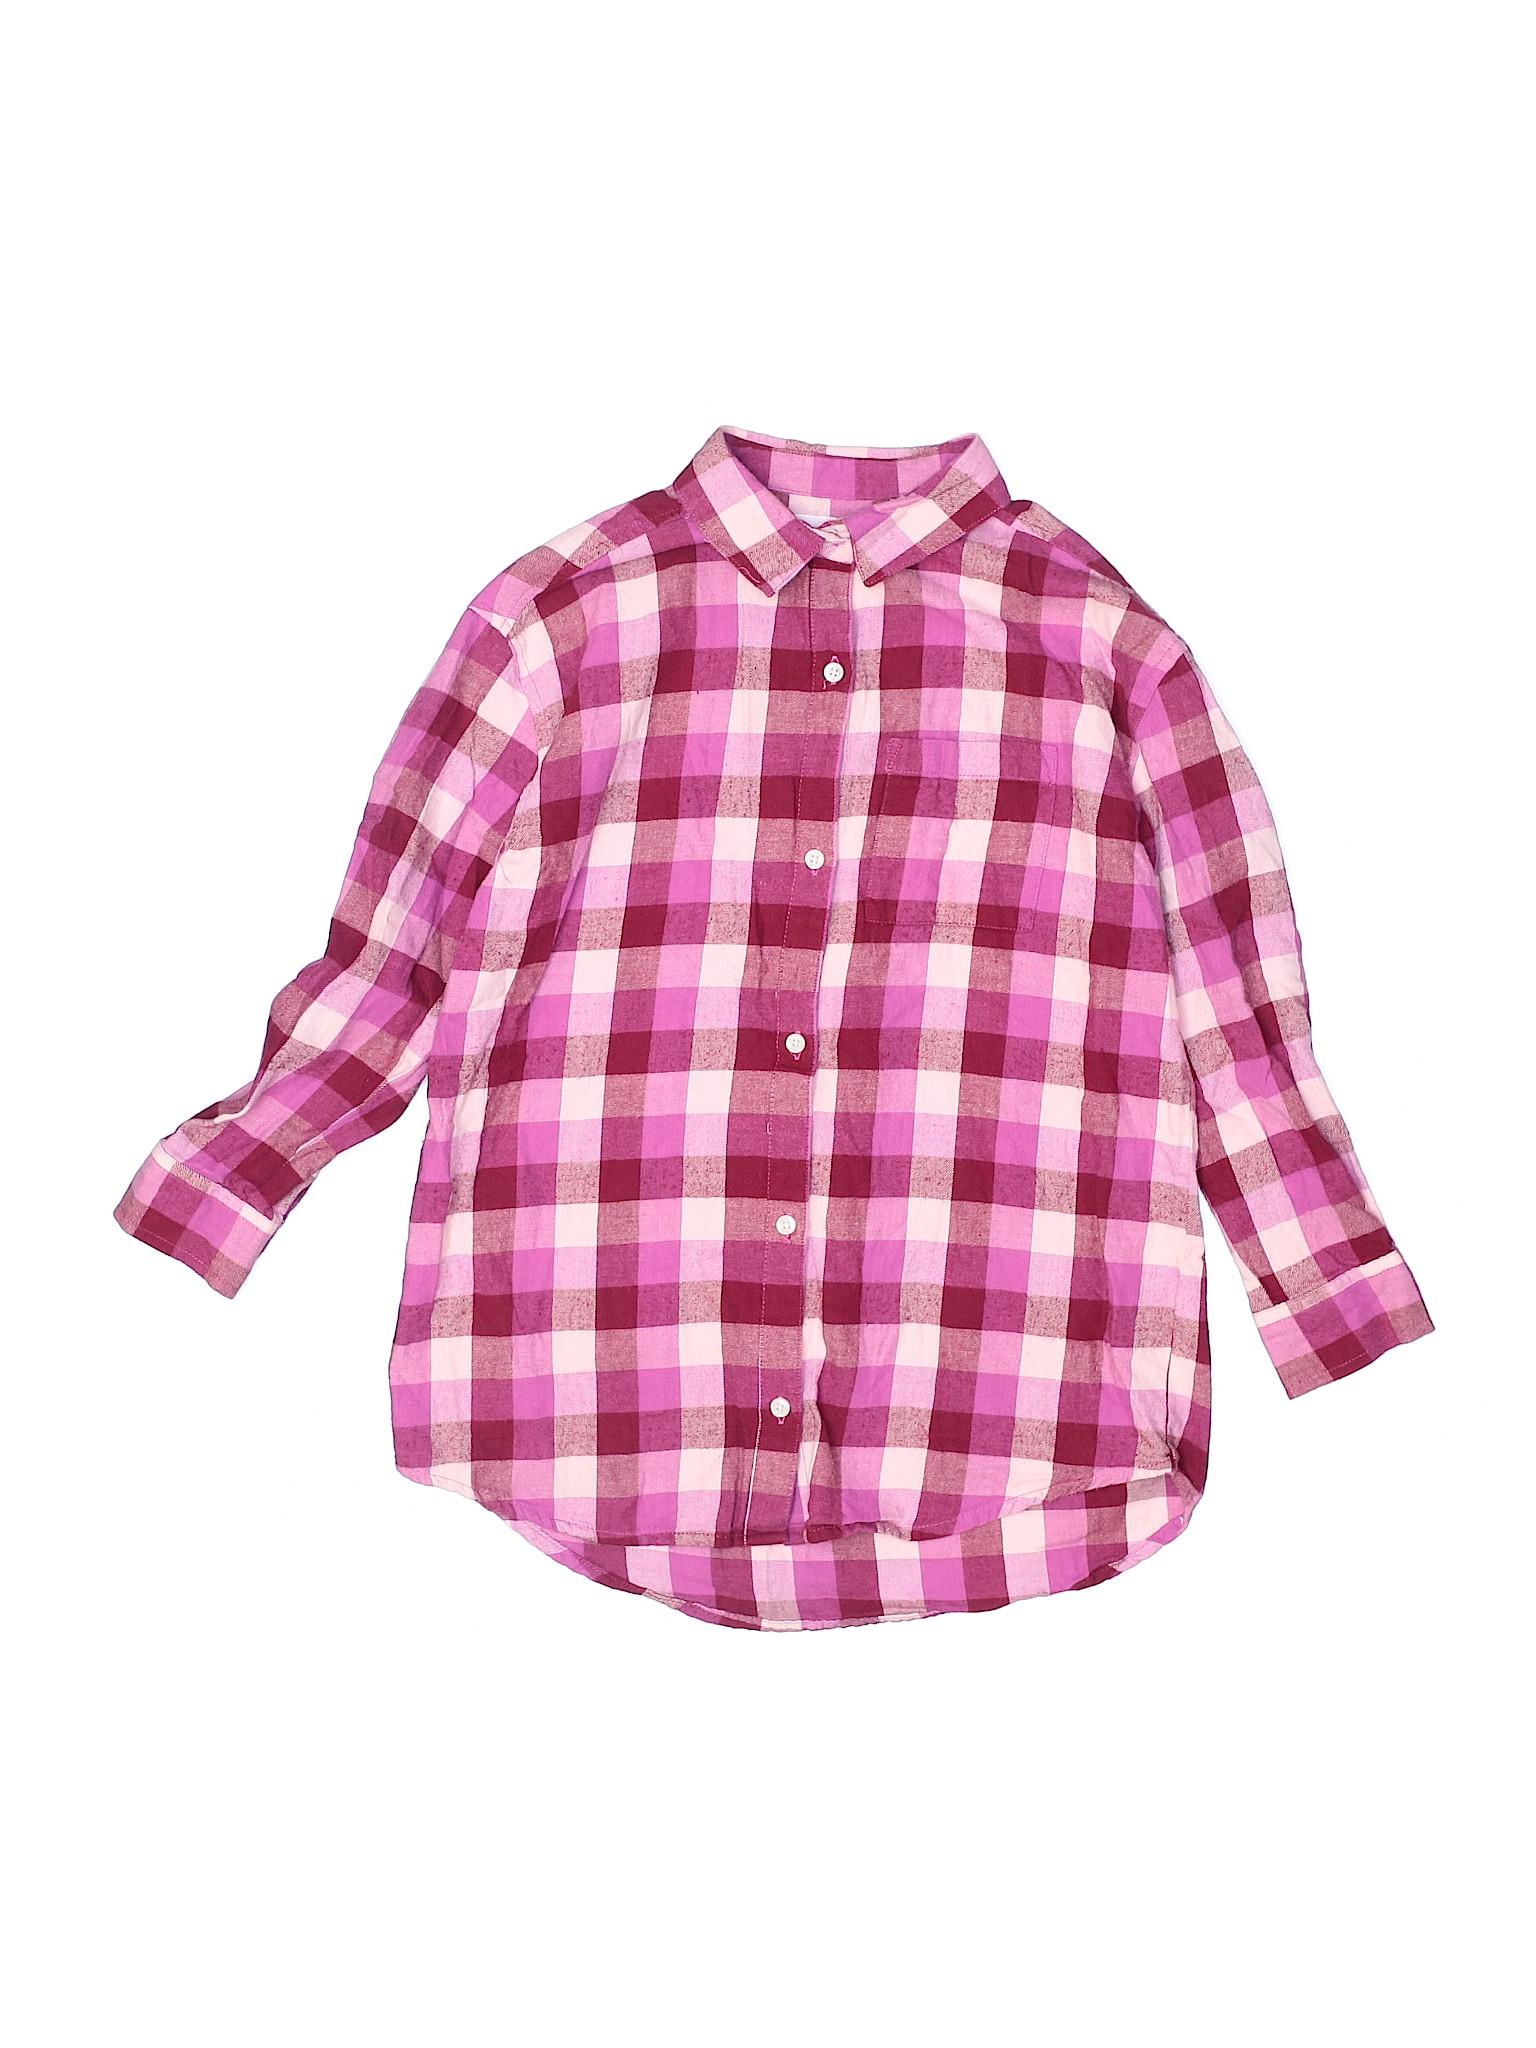 Old Navy Girls Pink Long Sleeve Button Down Shirt Large Kids Ebay